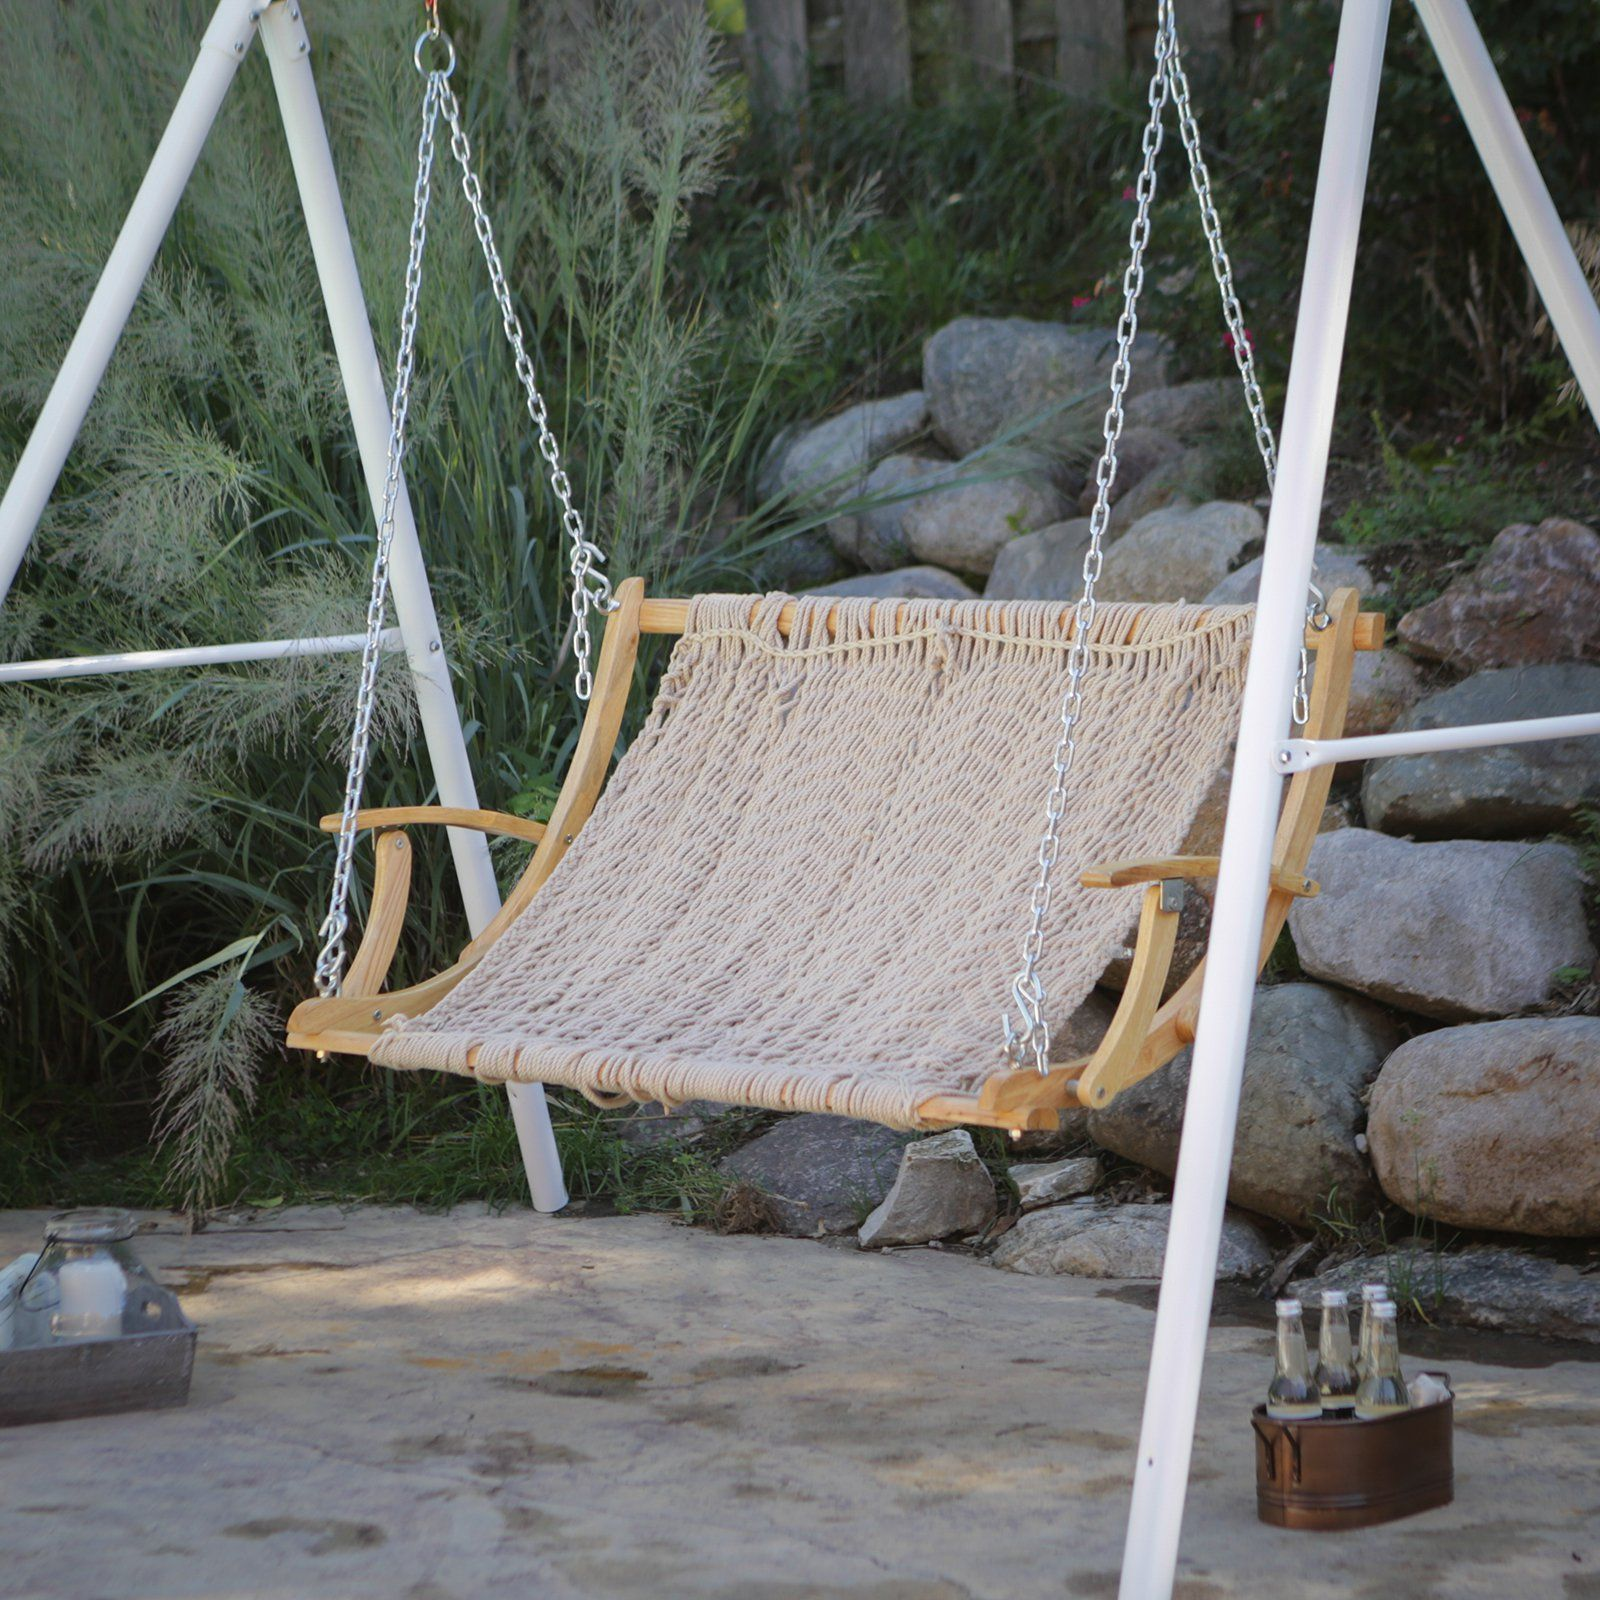 Island Bay Rope Double Hammock Swing Hammock Chairs & Swings at